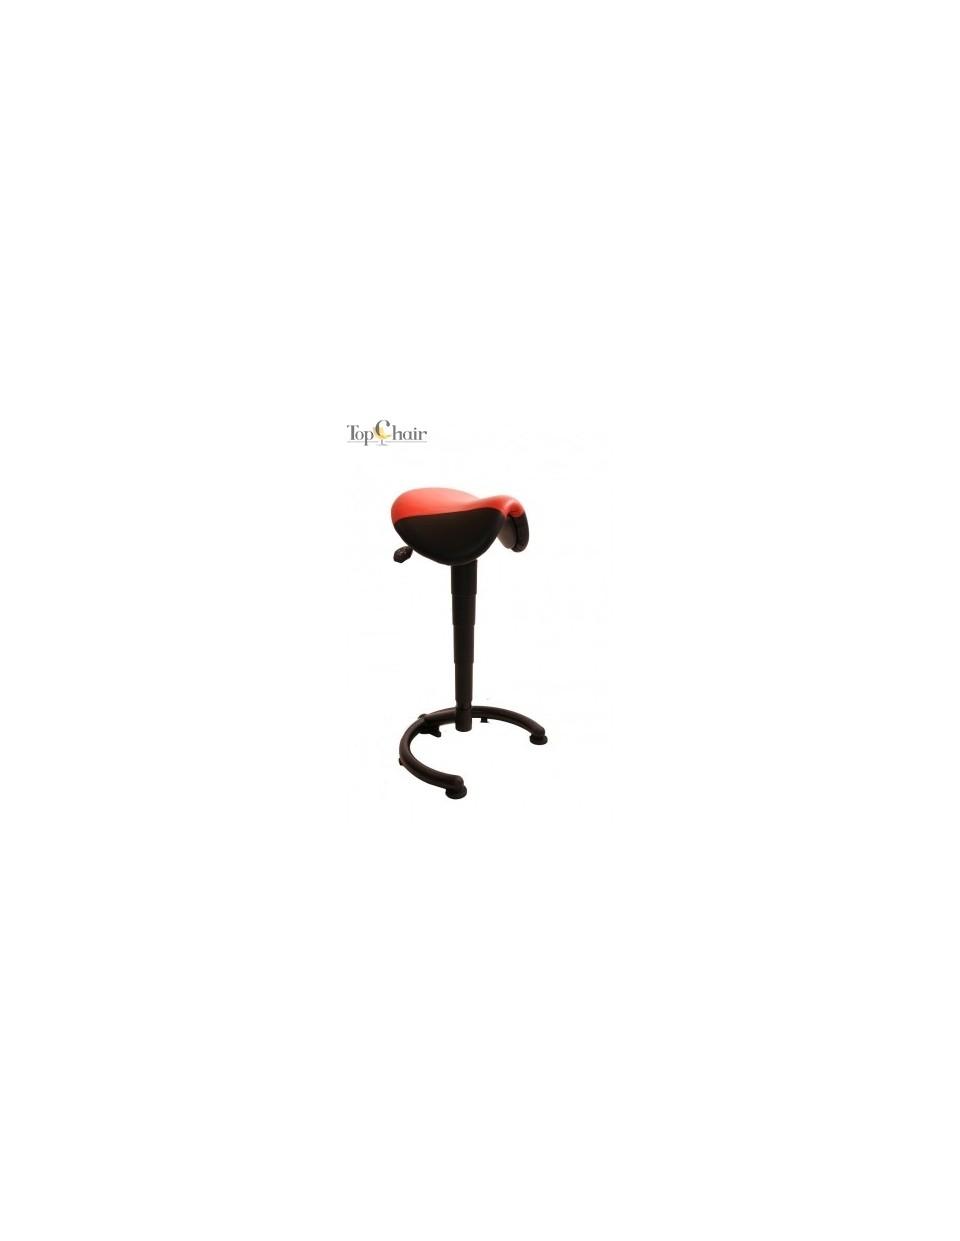 stolac-za-glazbenike-af4-h-kl11-98-9005